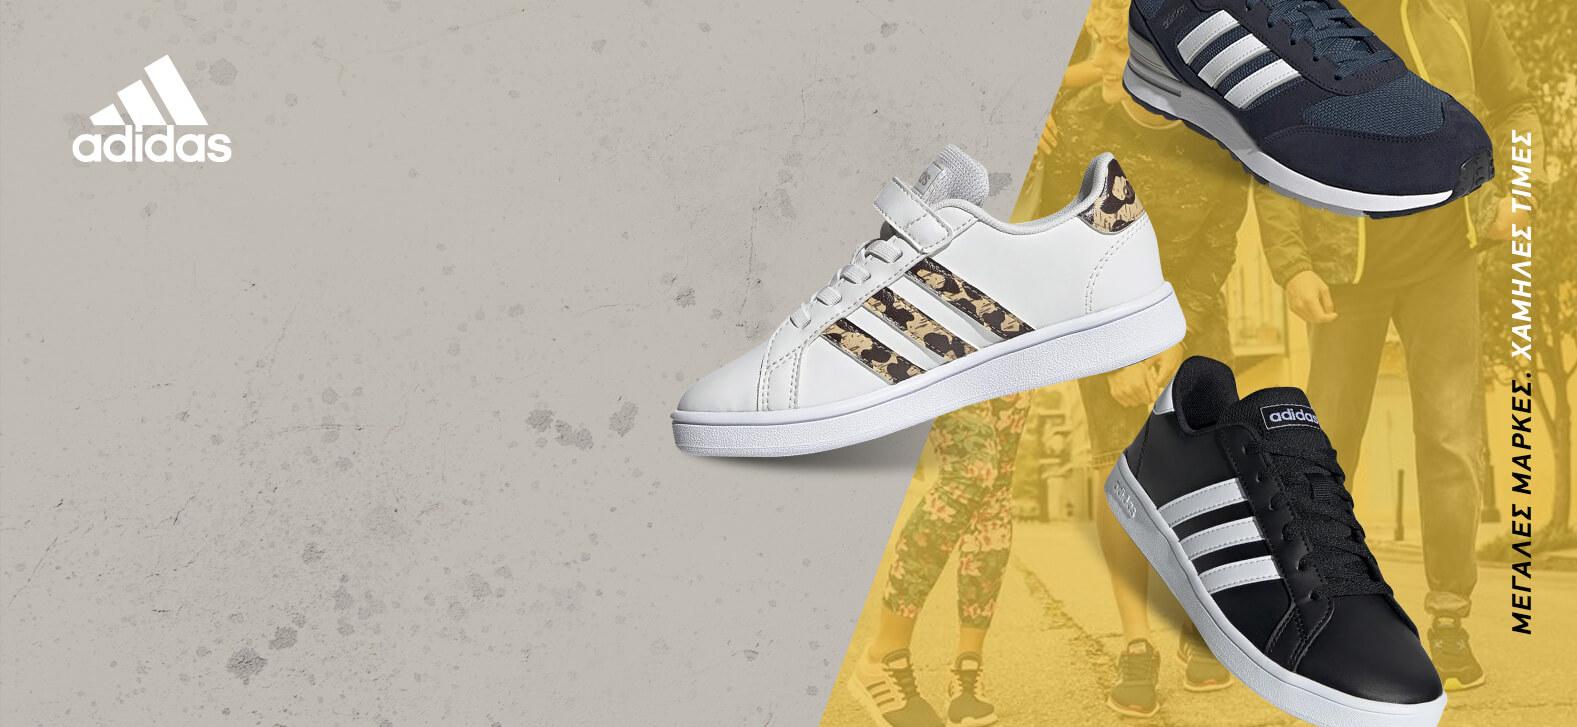 adidas Παπούτσια από 30€